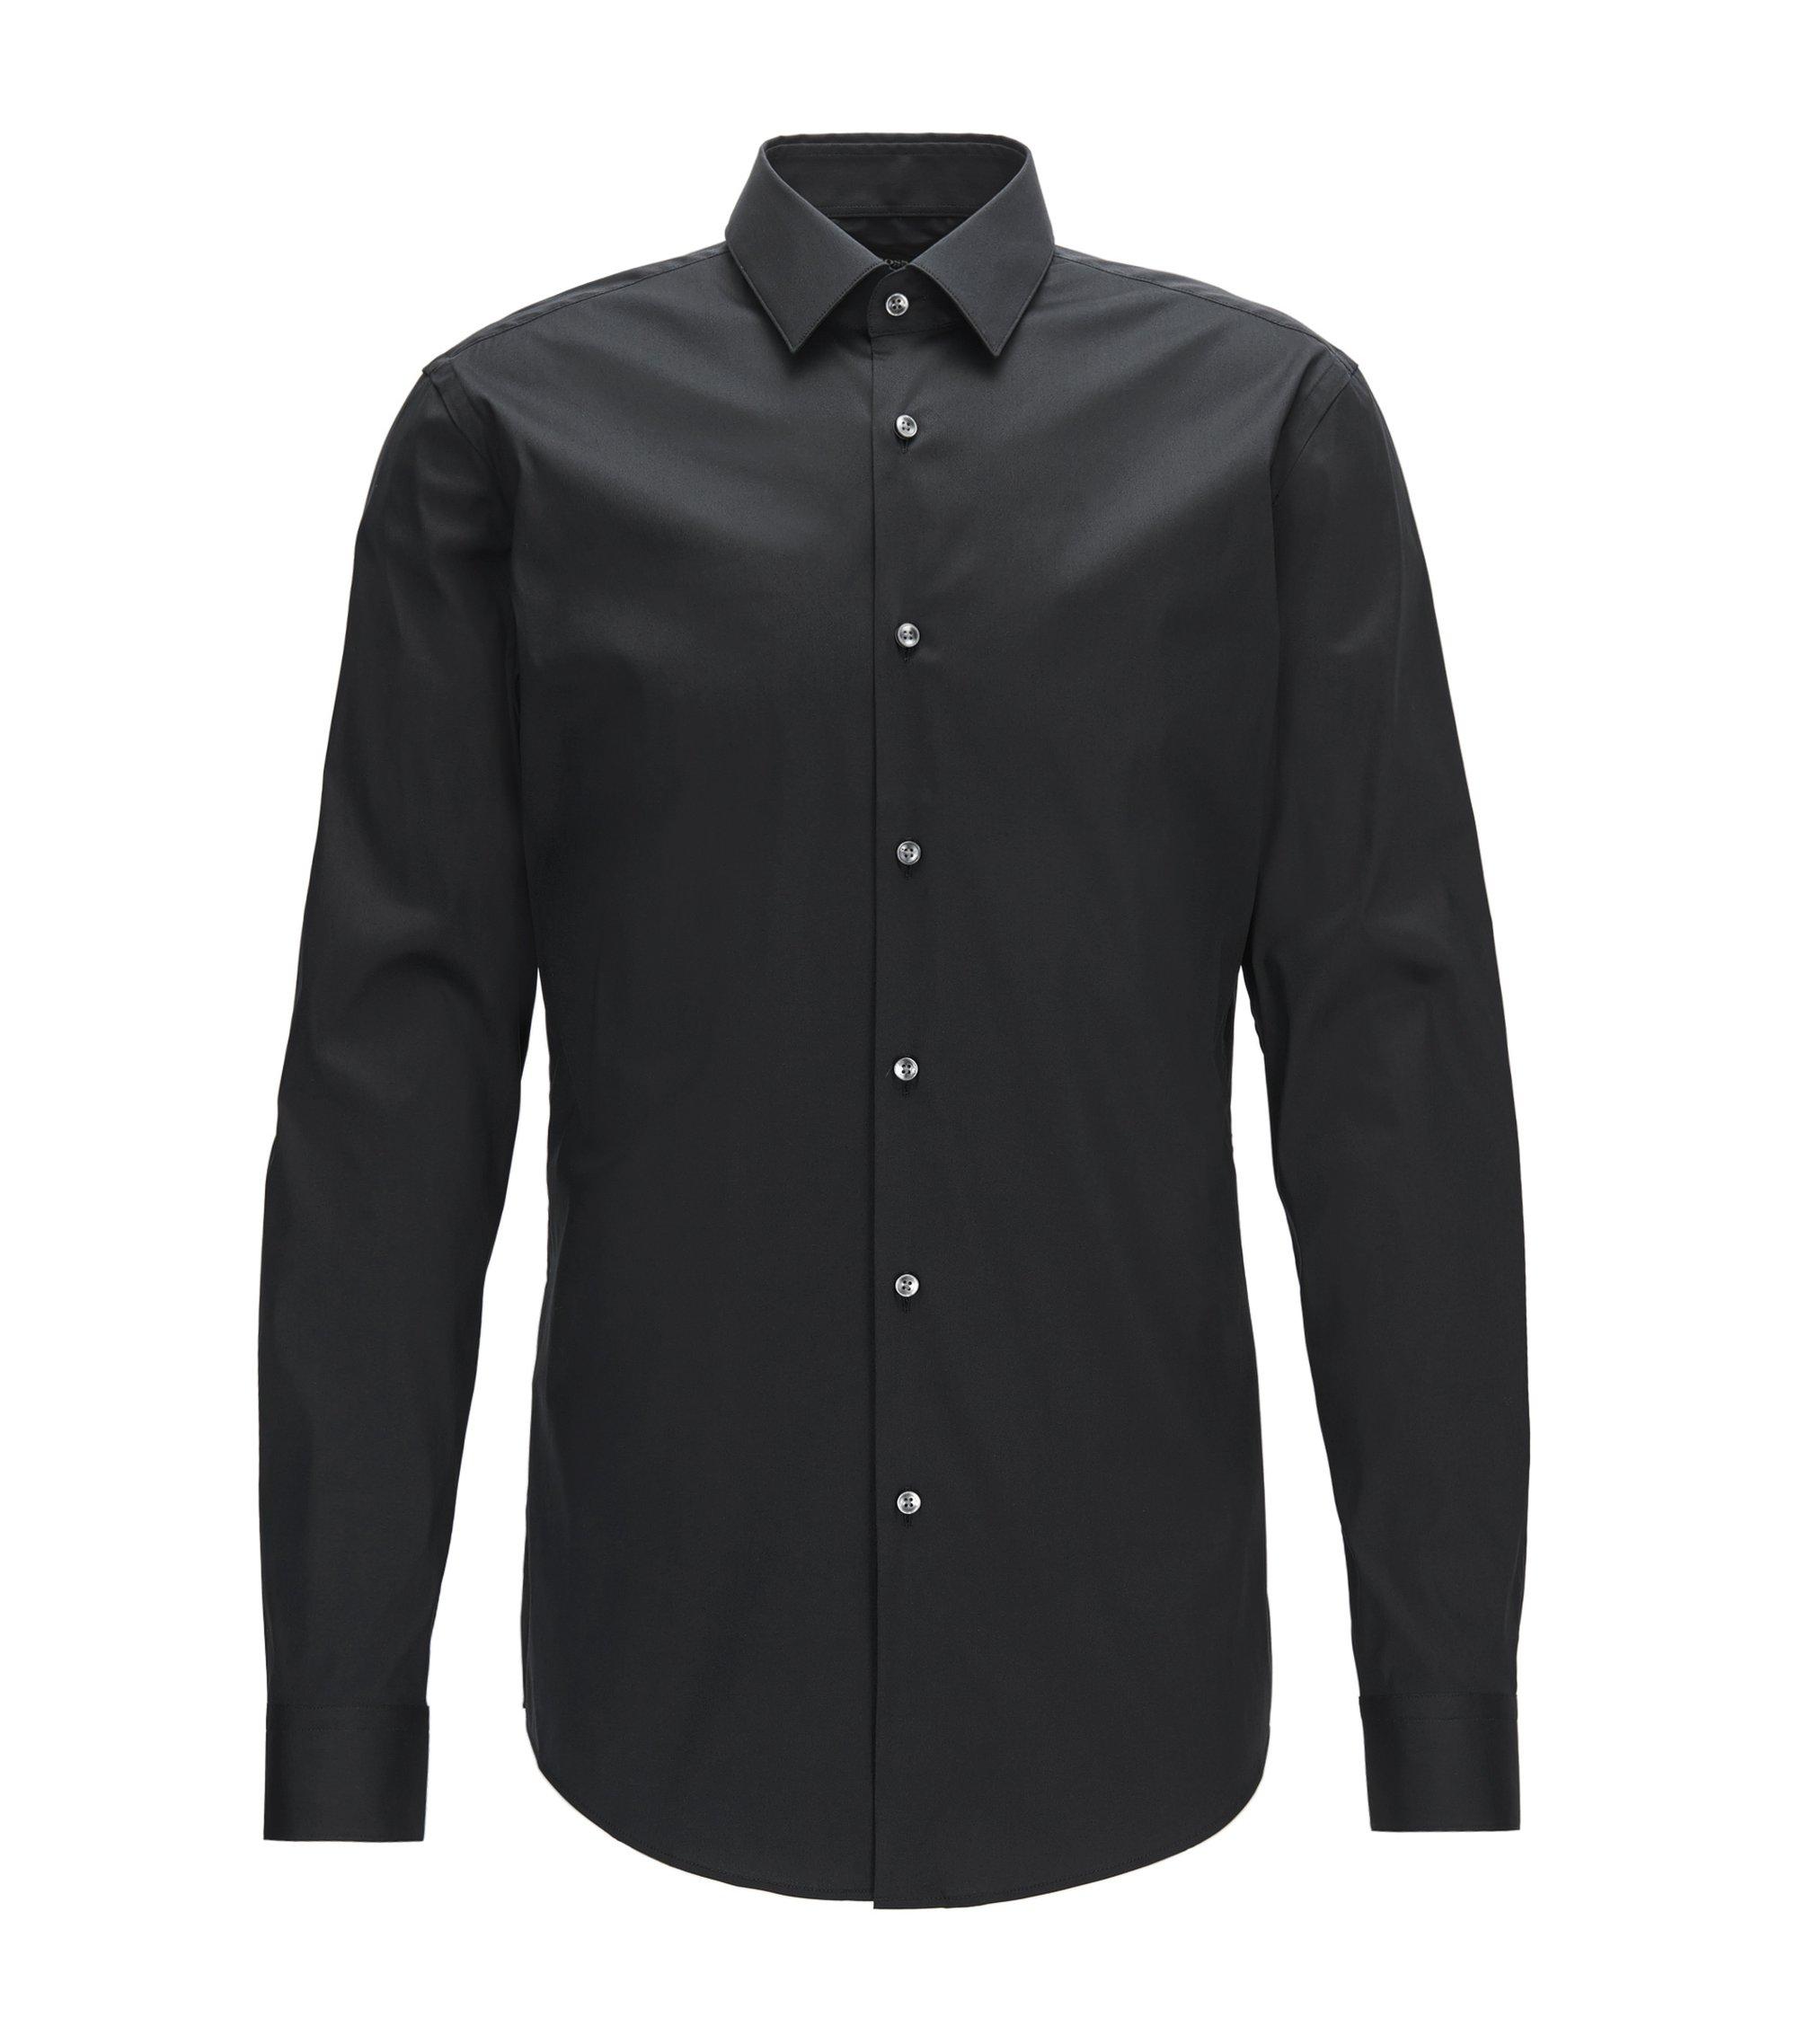 Extra-slim-fit shirt in stretch cotton-blend poplin, Black